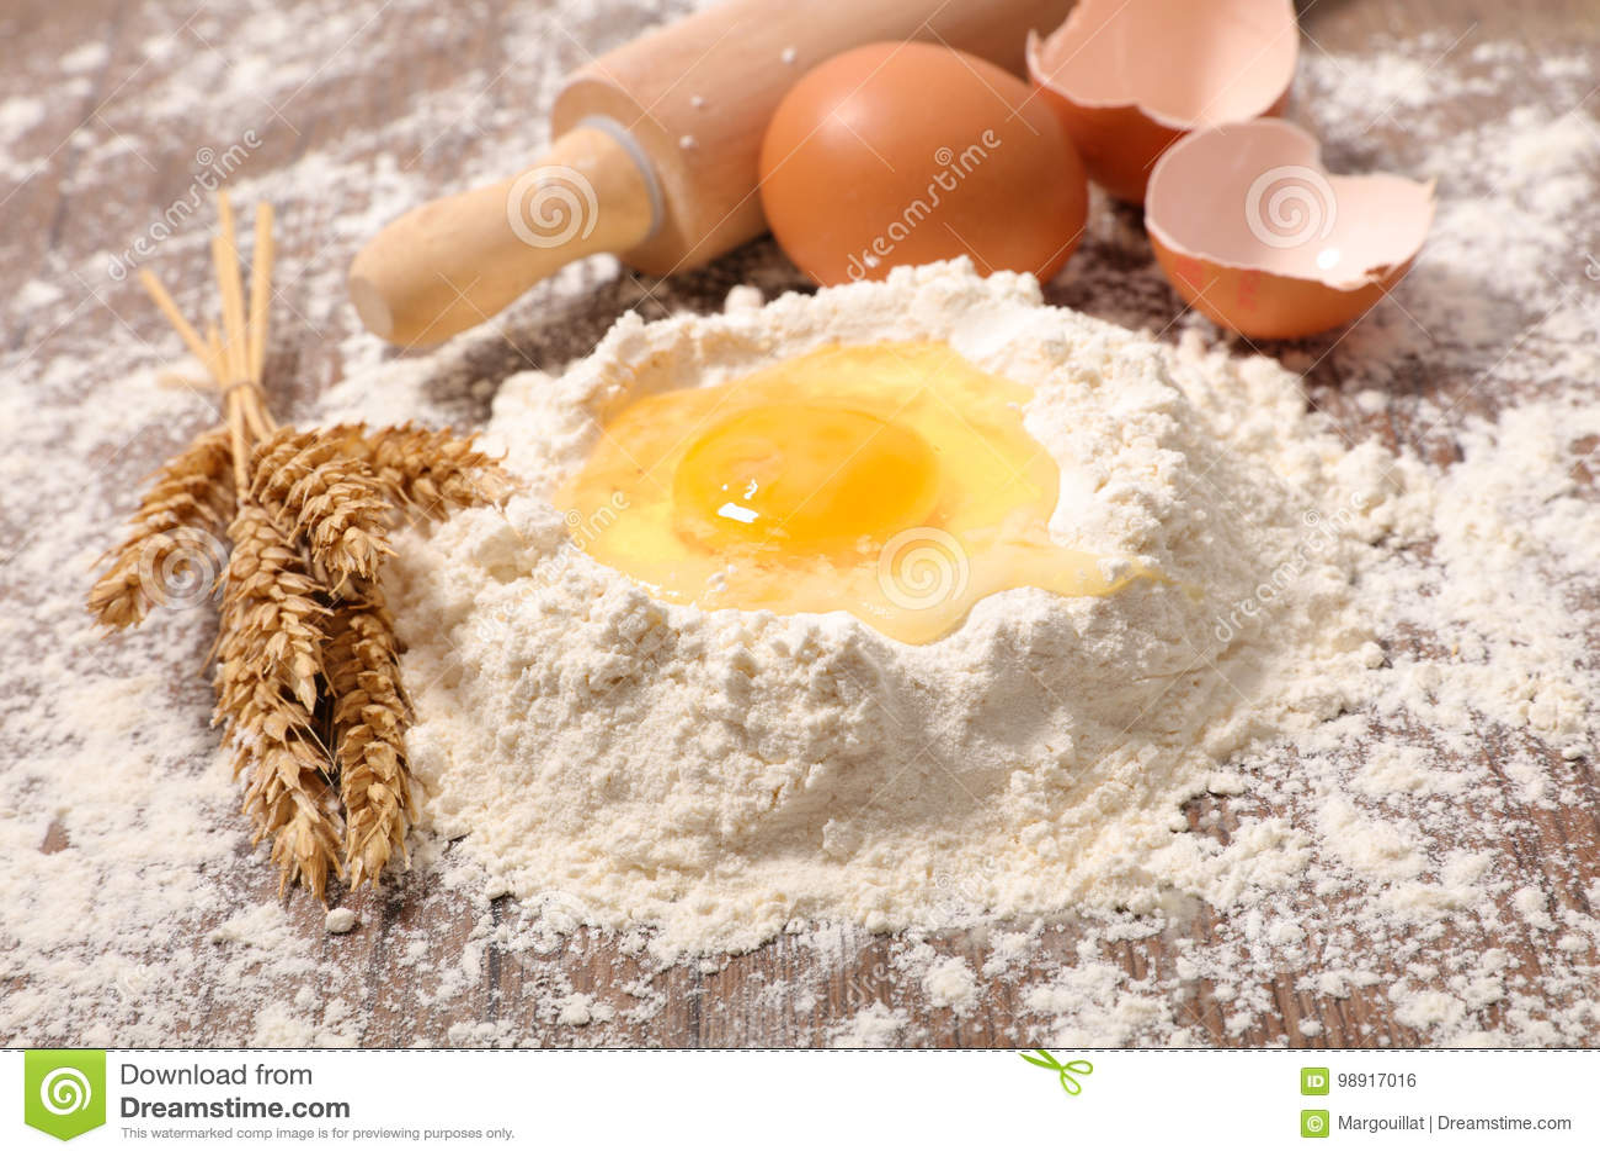 Farinha e ovo